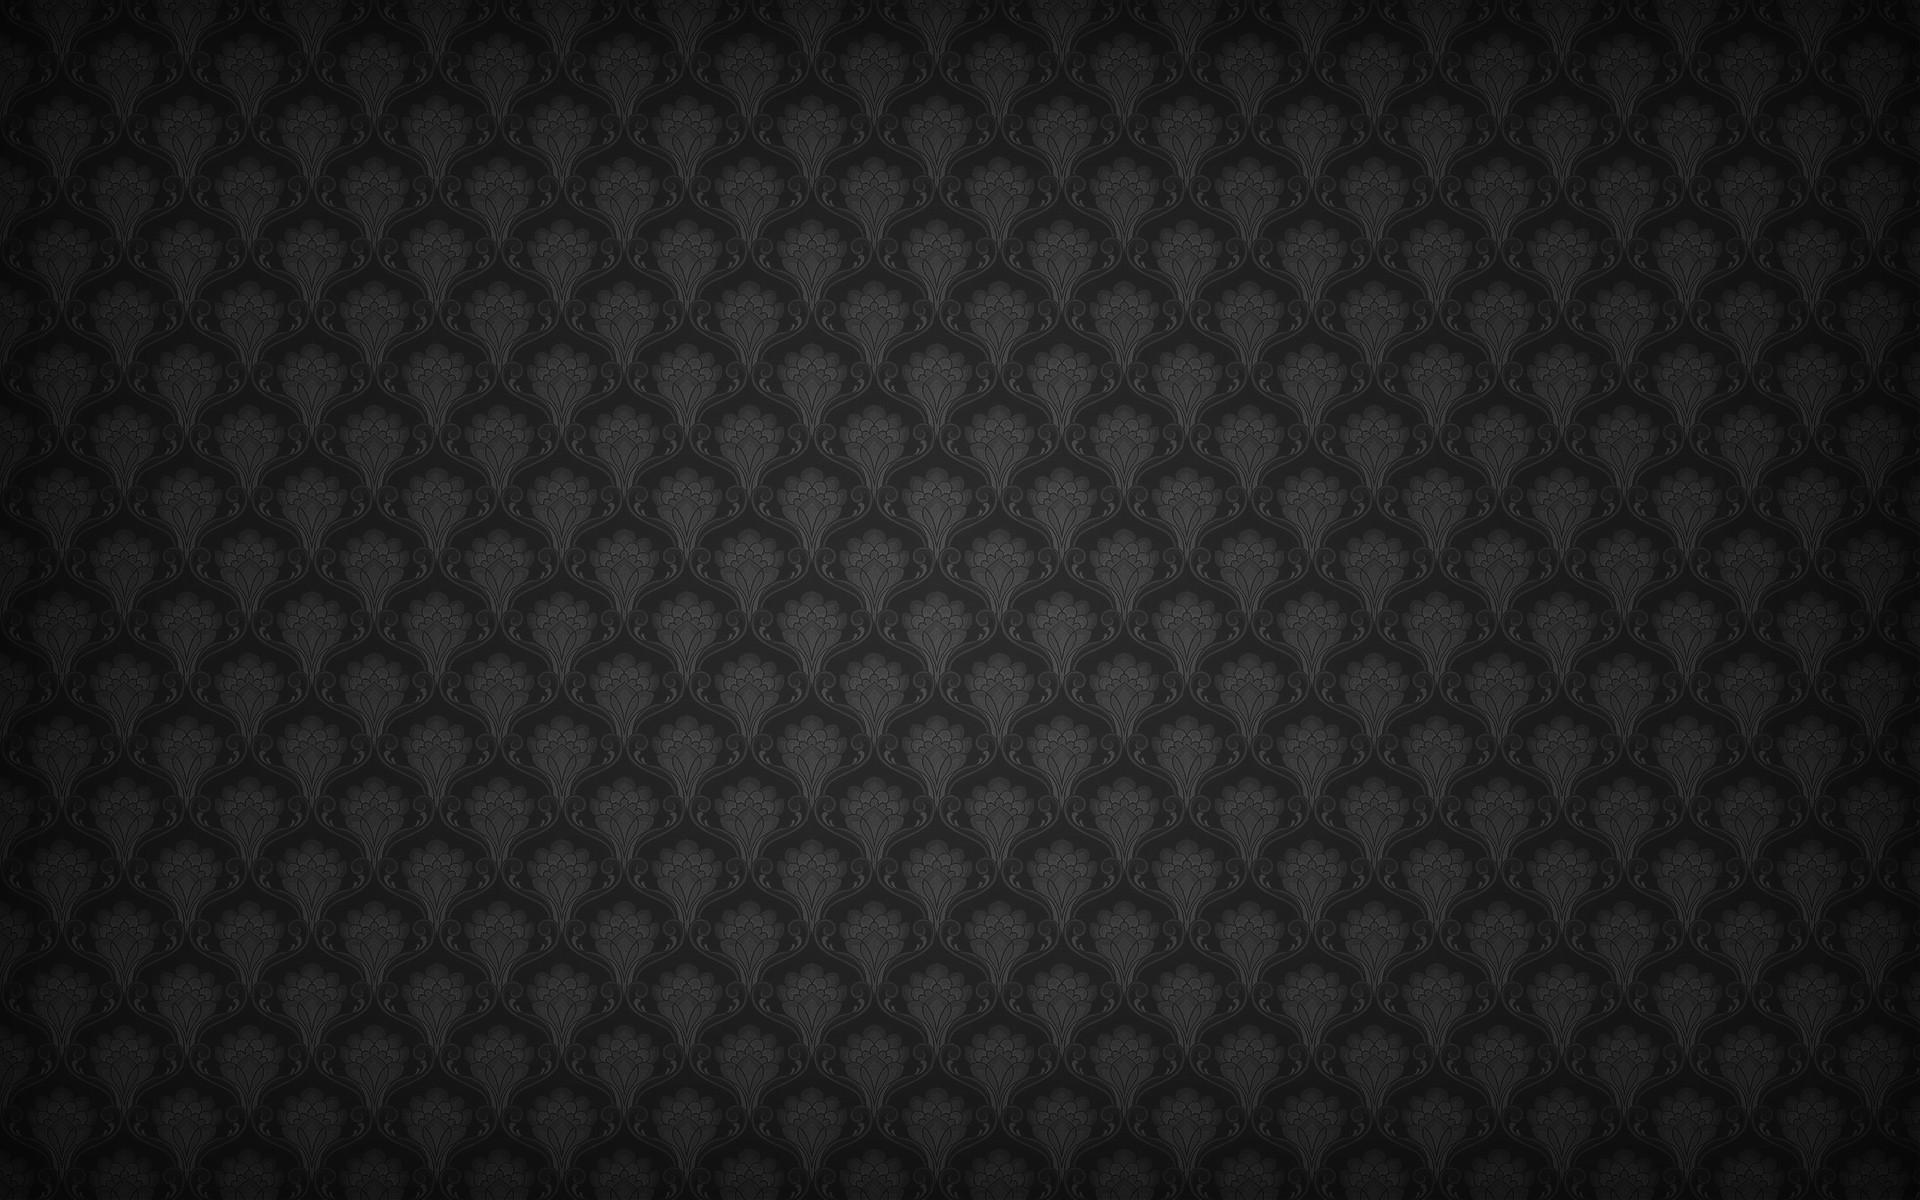 Black And Gold Wallpaper Android 7 Desktop Wallpaper